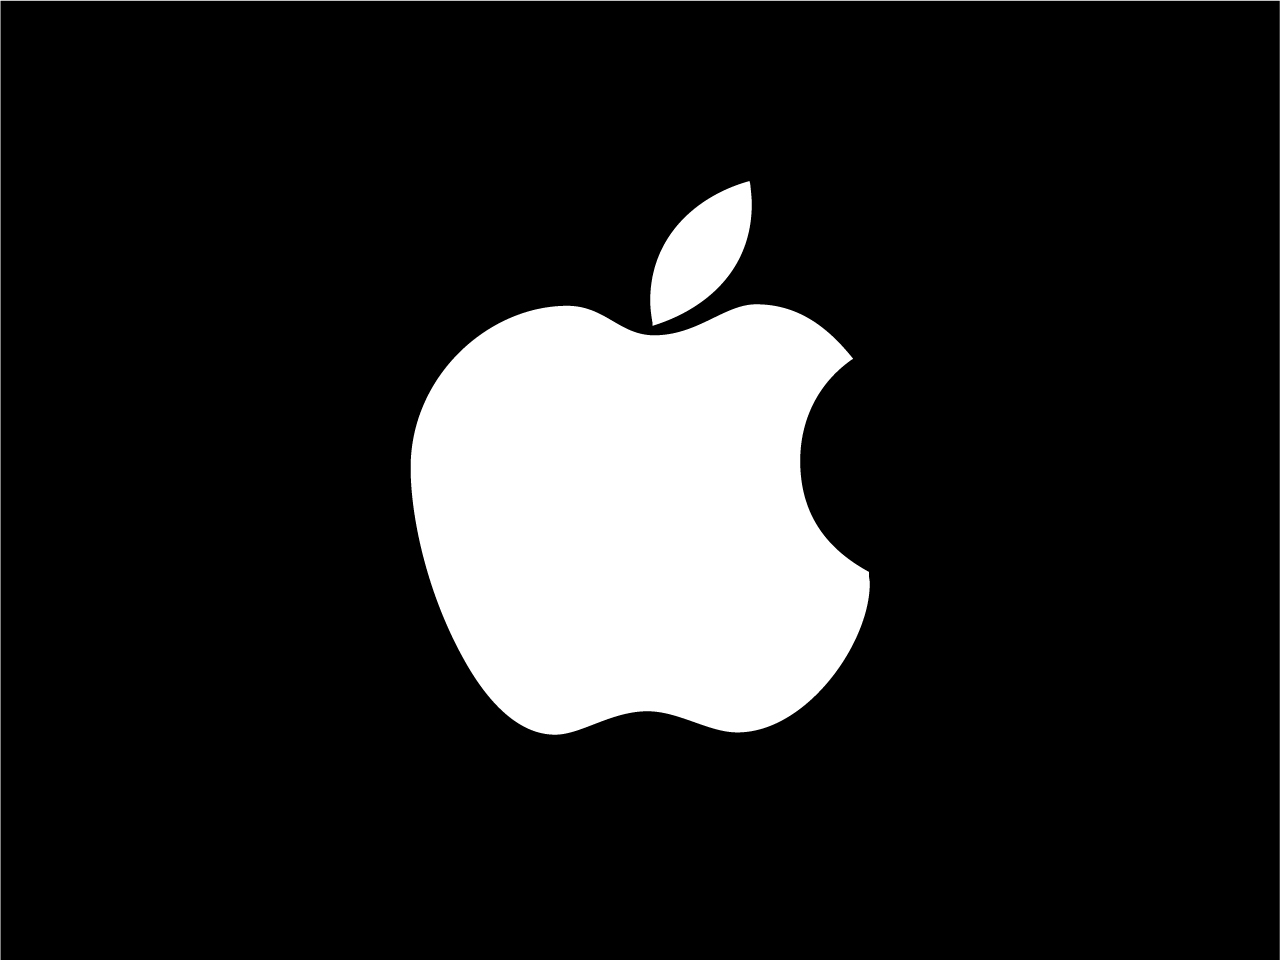 【2018/9/20】【UQmobile】【au】【iphone5s】【ios12】iosアップグレード後モバイル通信が不可になった件の対処